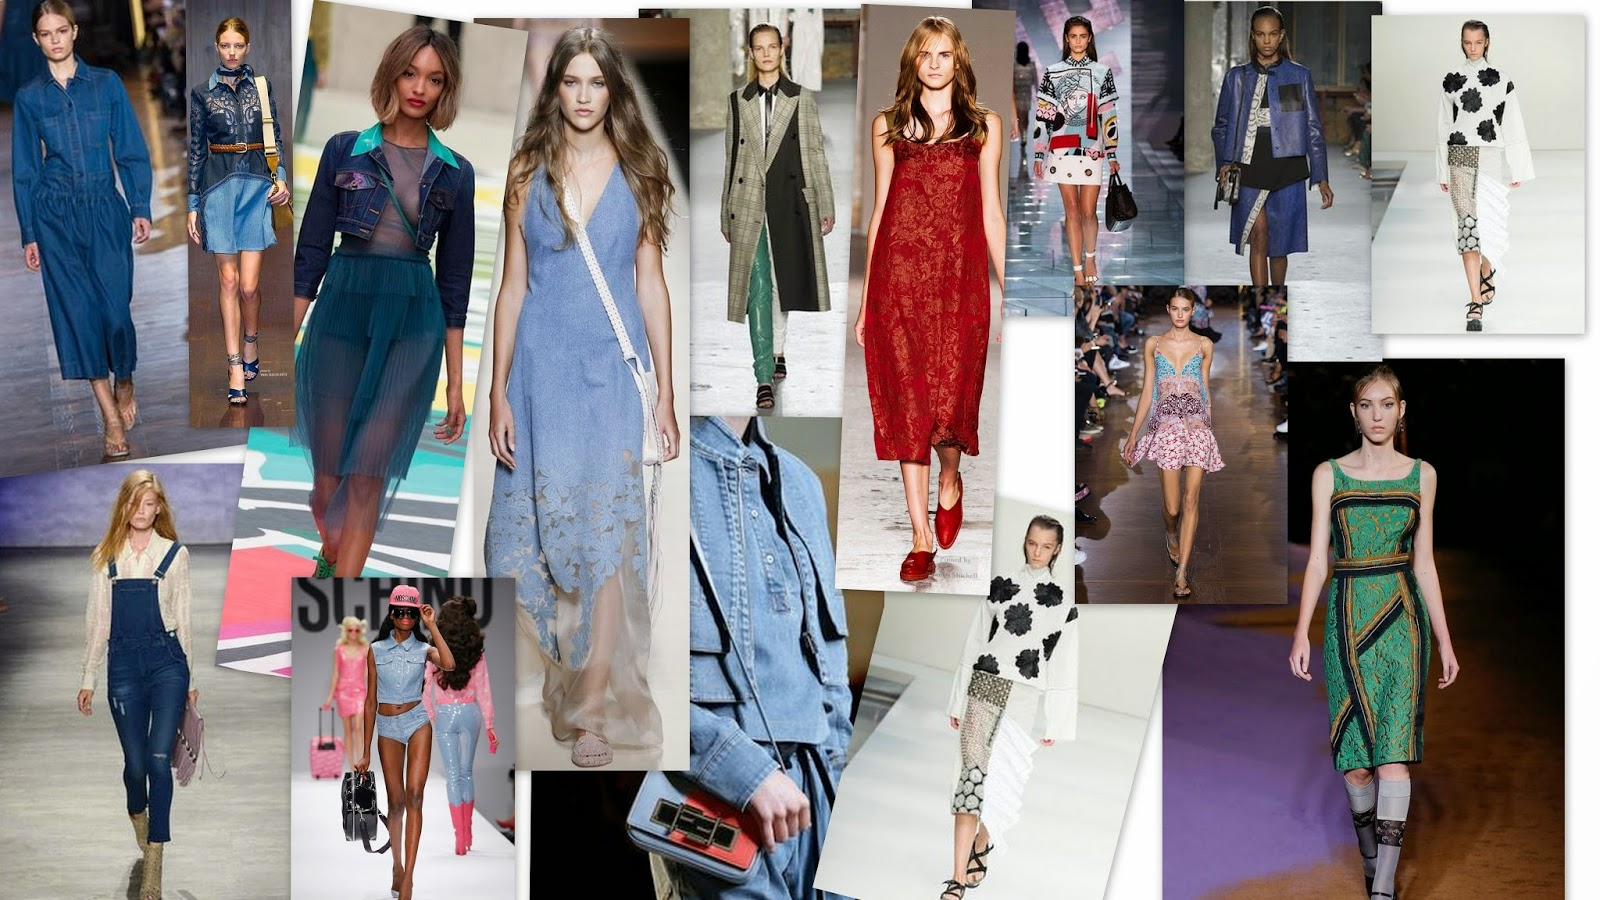 Spring/Summer Womenswear Catwalk Trend Report 2015